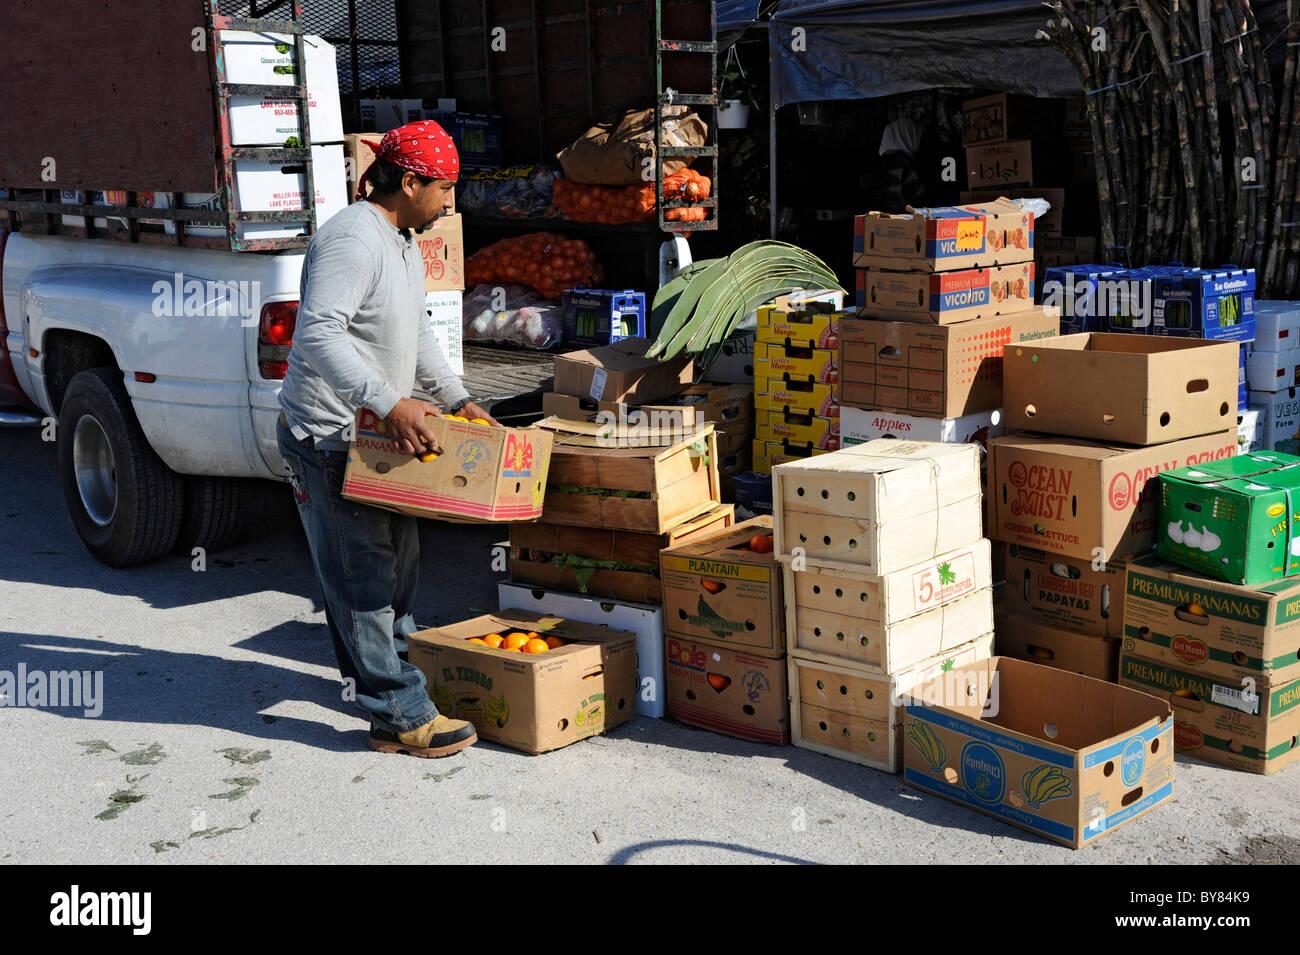 fruit citrus florida Bradenton bargain browse buy clearance Diet Eat Food Groceries Meal Nourish Nourishment Nutrition - Stock Image